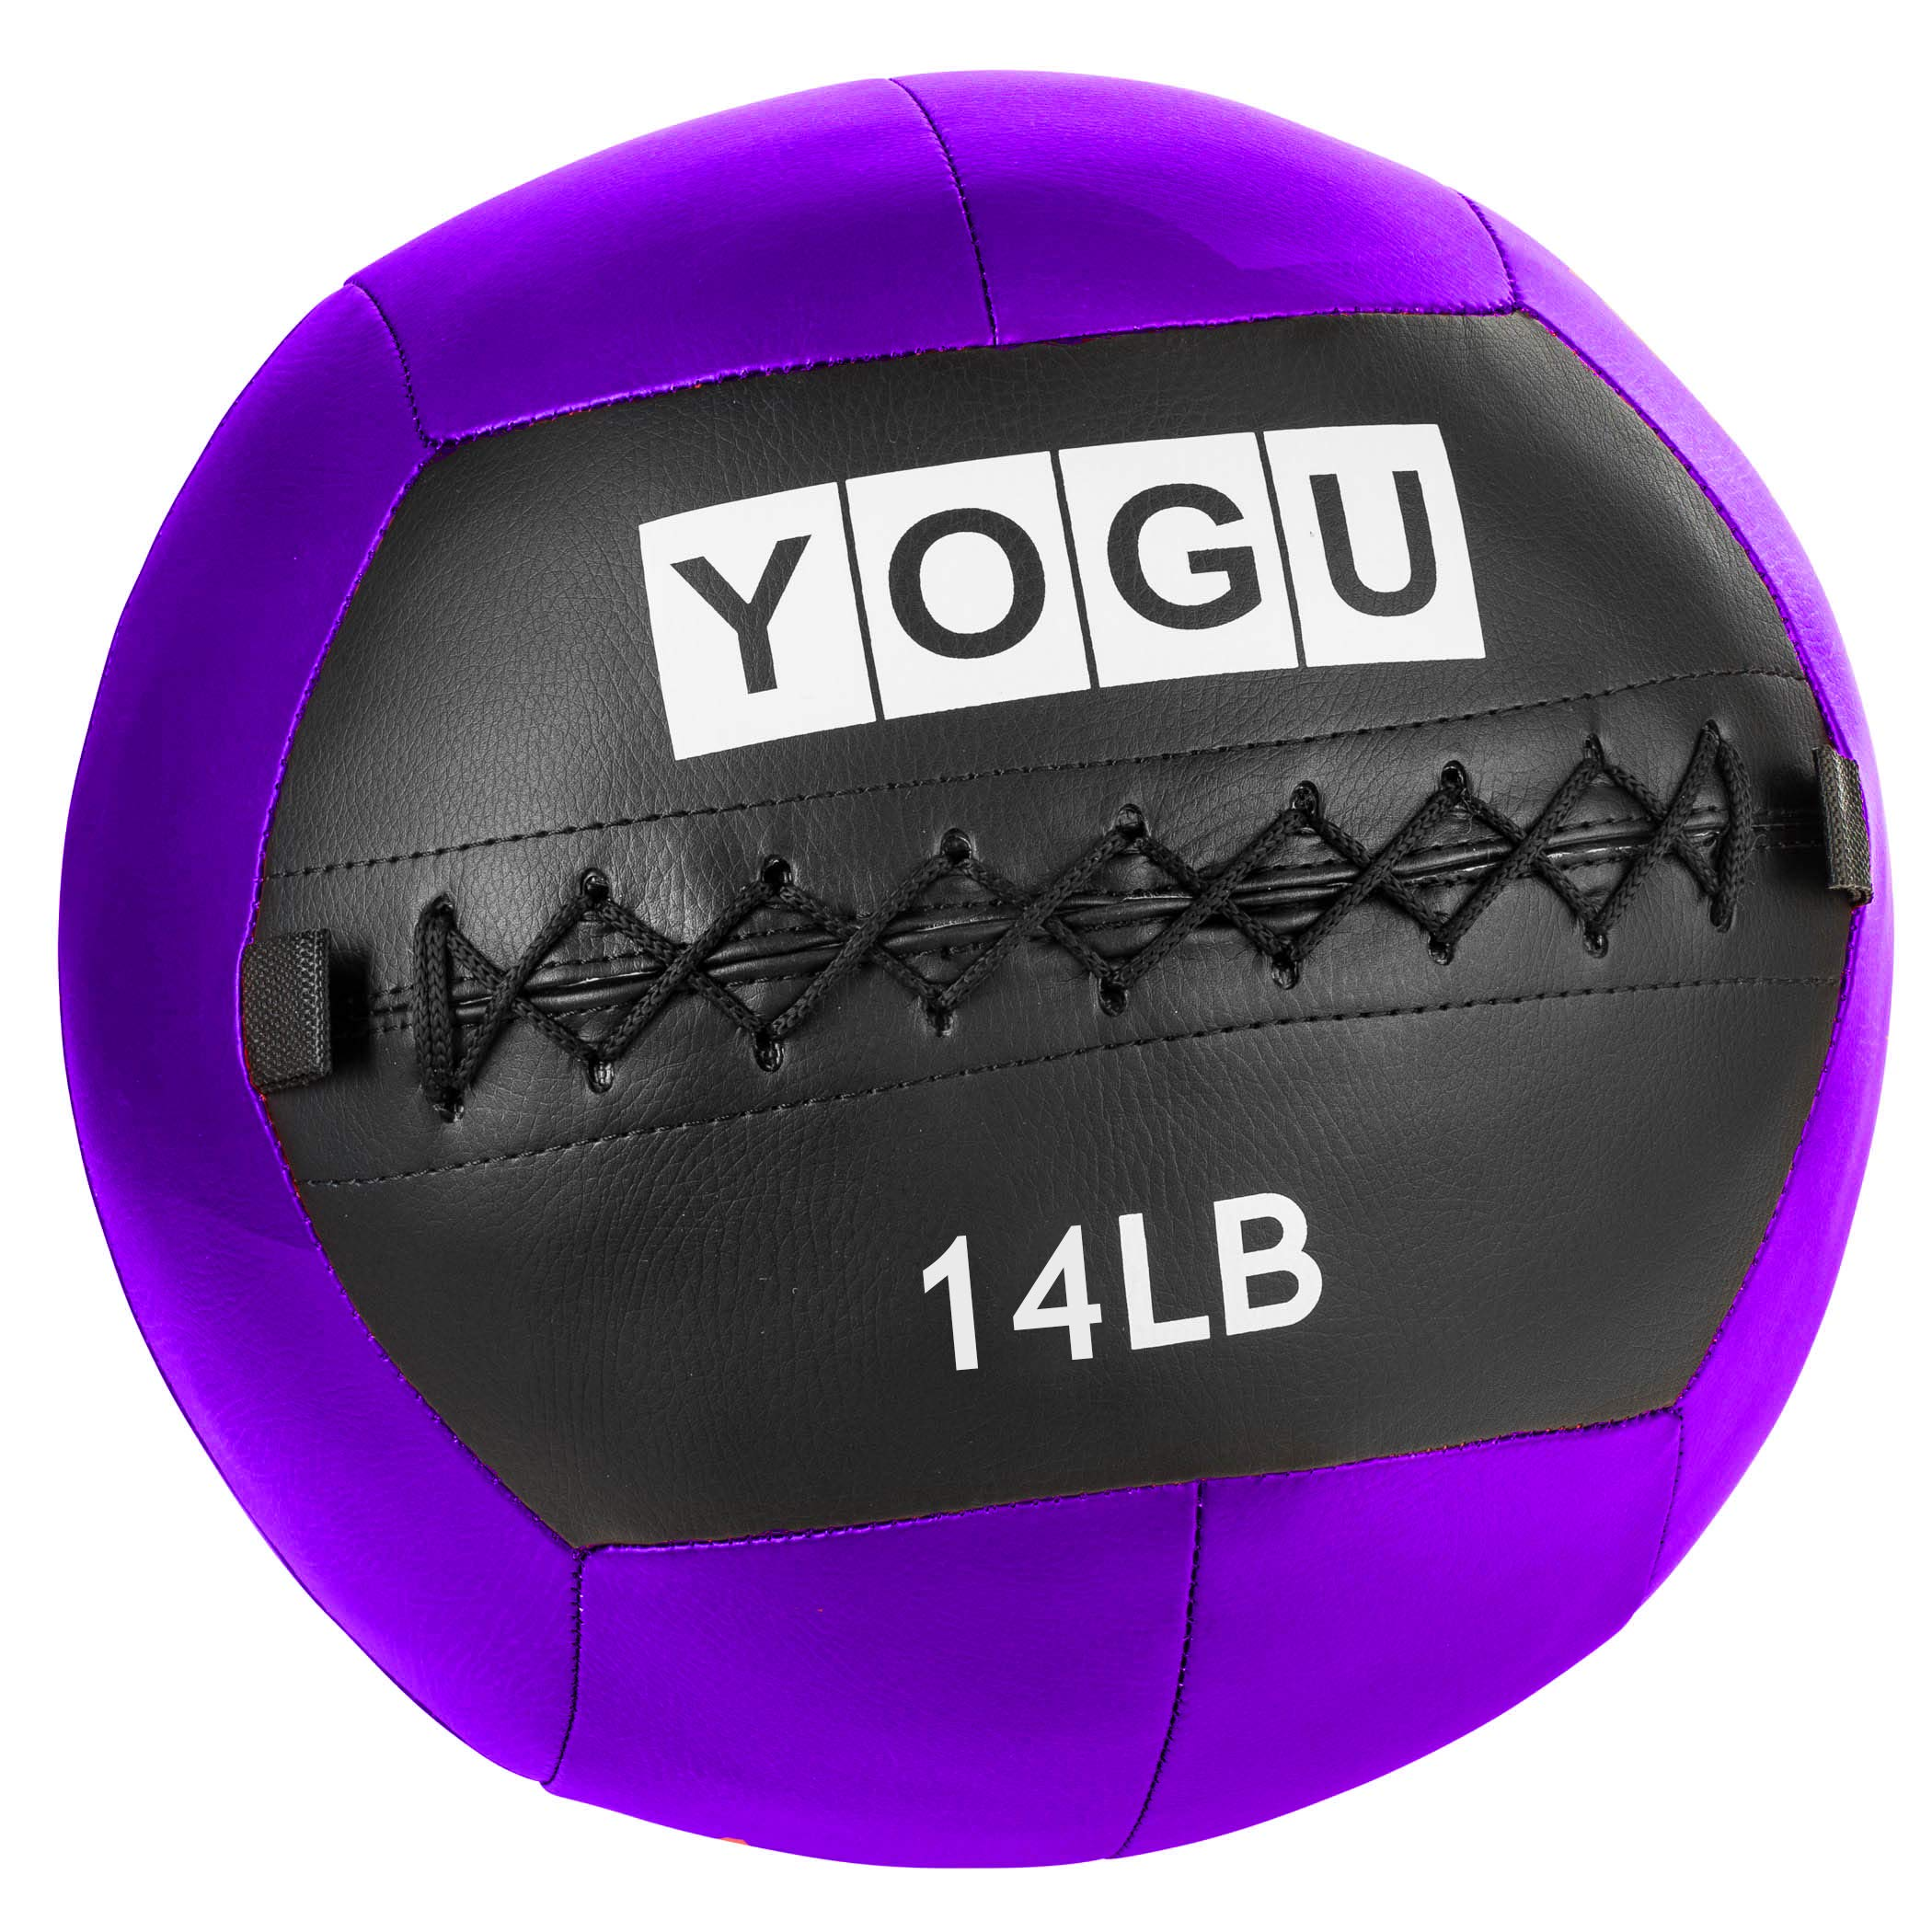 YOGU Soft Medicine Ball (14.0 Pounds)